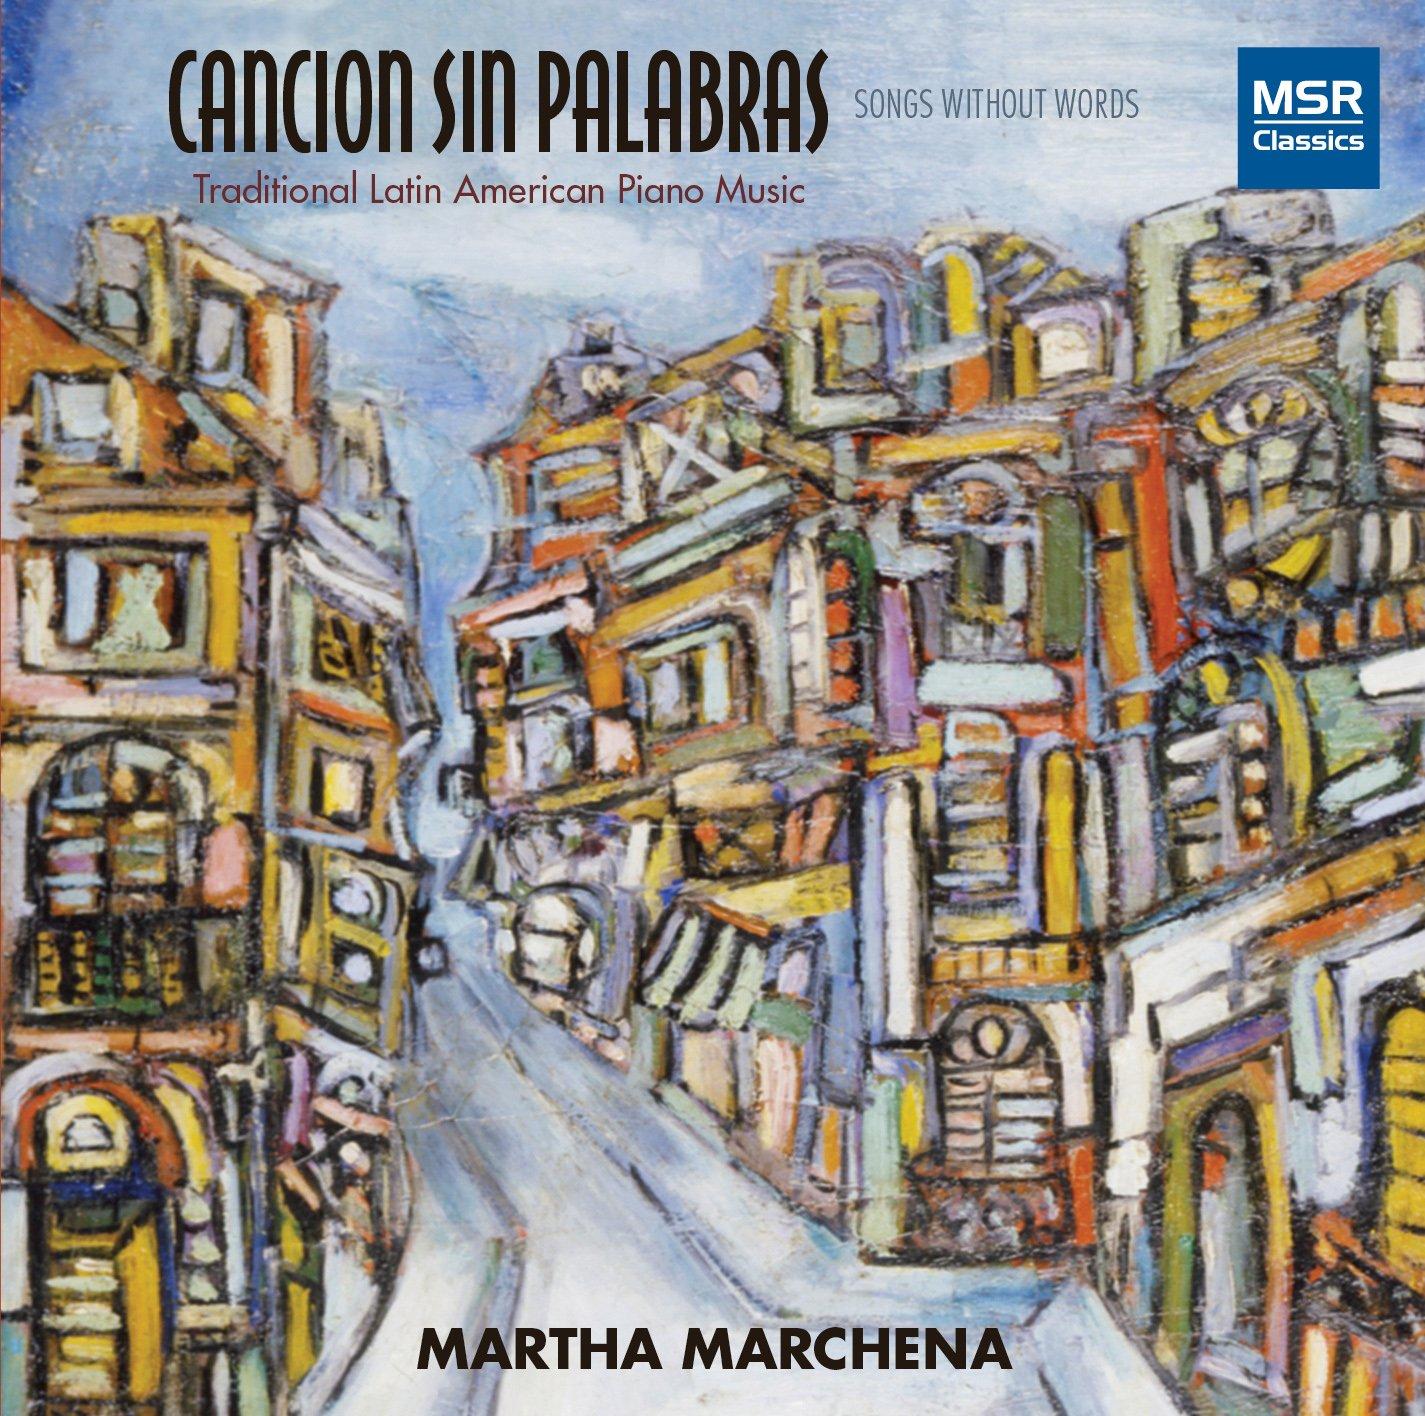 CD : MARTHA MARCHENA (PIANO) - Cancion Sin Palabras (CD)